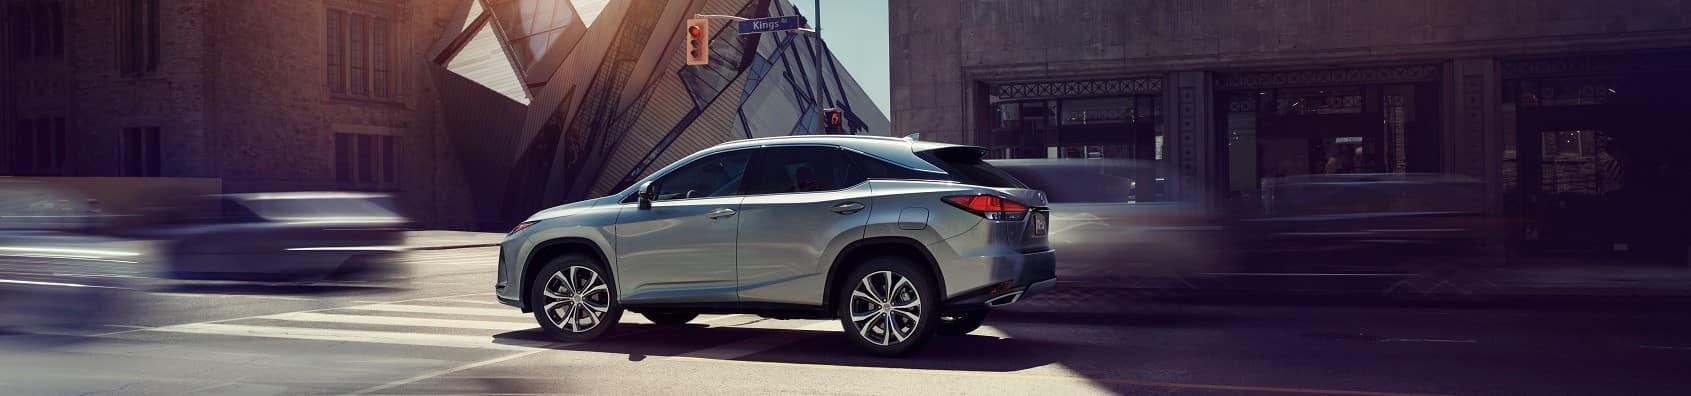 2021 Lexus UX Hybrid driving through the city